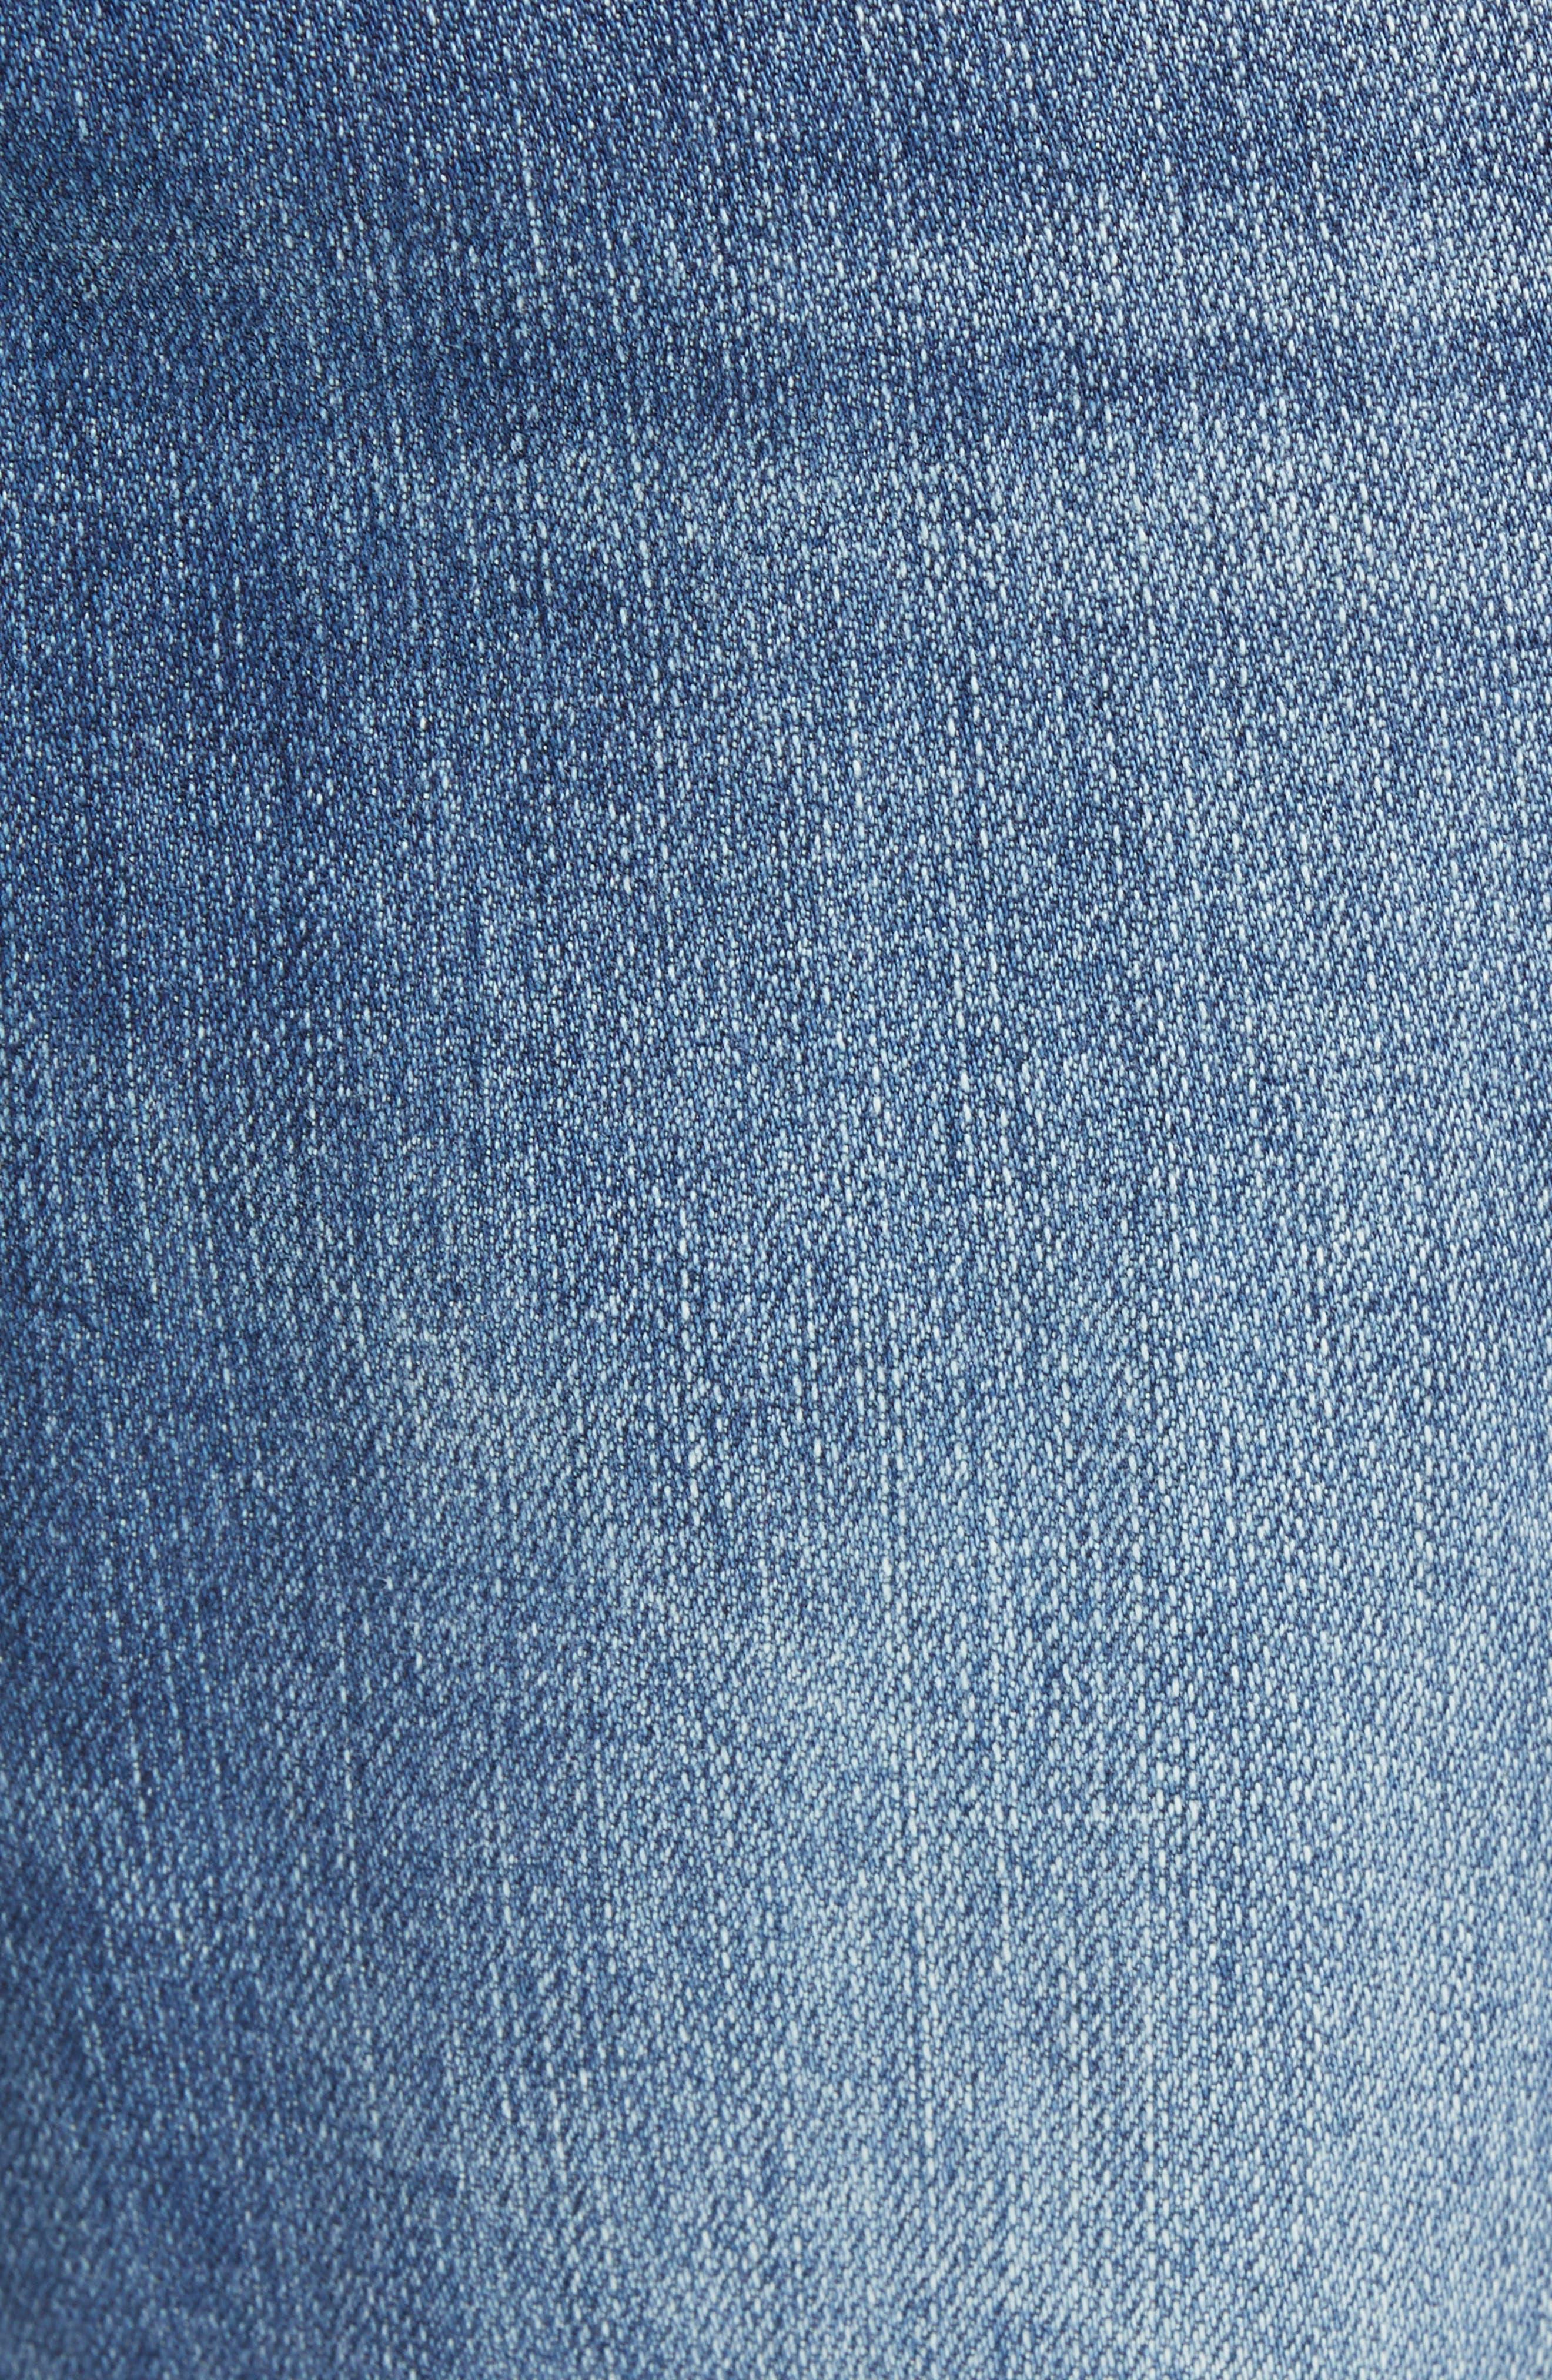 Jeans Co. Slim Straight Leg Jeans,                             Alternate thumbnail 5, color,                             BRYSON VINTAGE MED